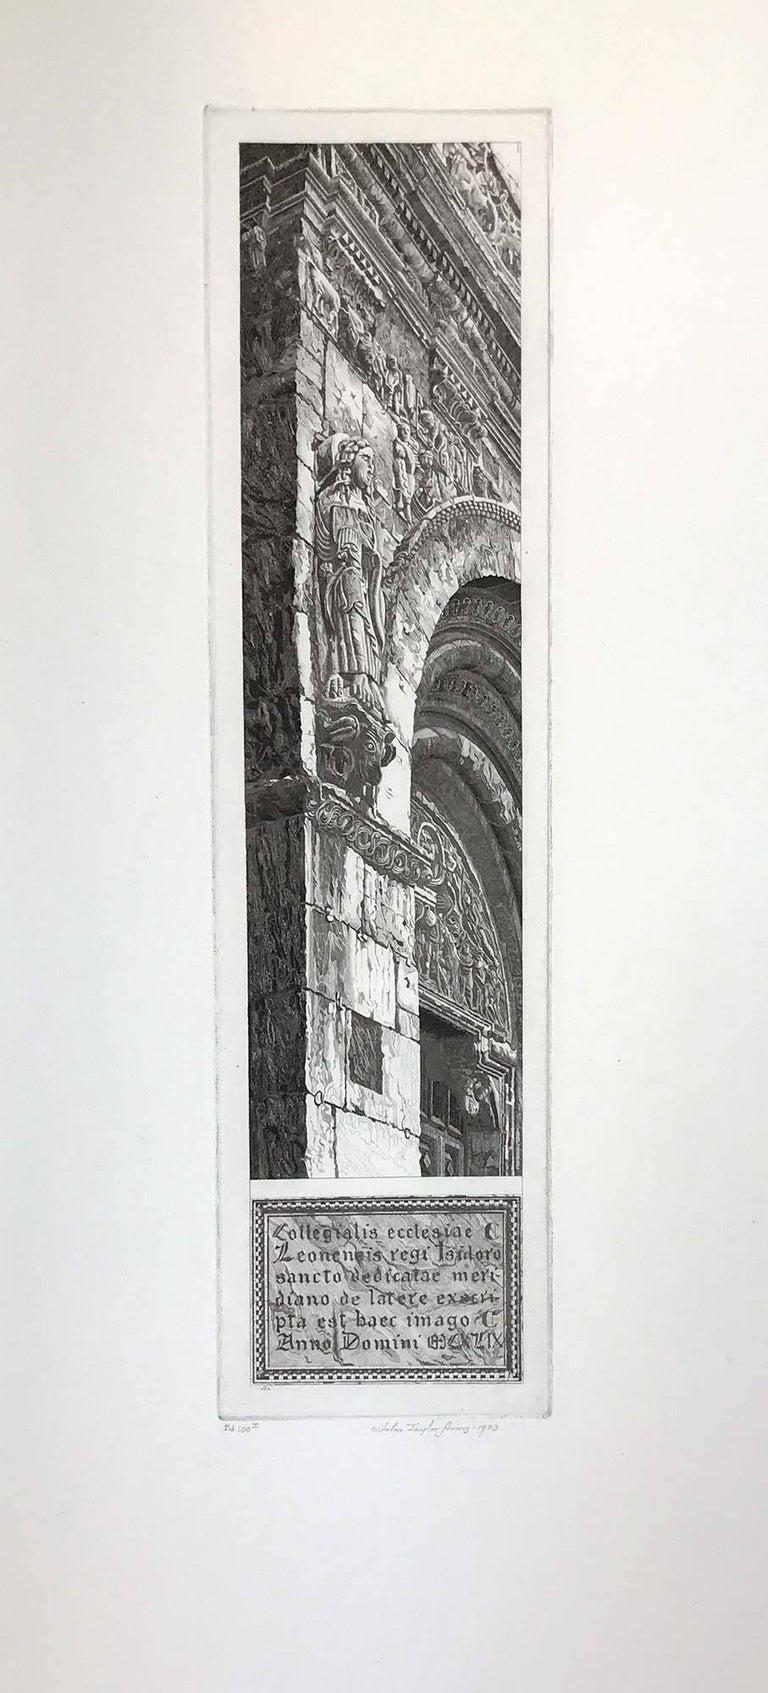 John Taylor Arms Landscape Print - Stone Tapestry, San Isidoro, Leon